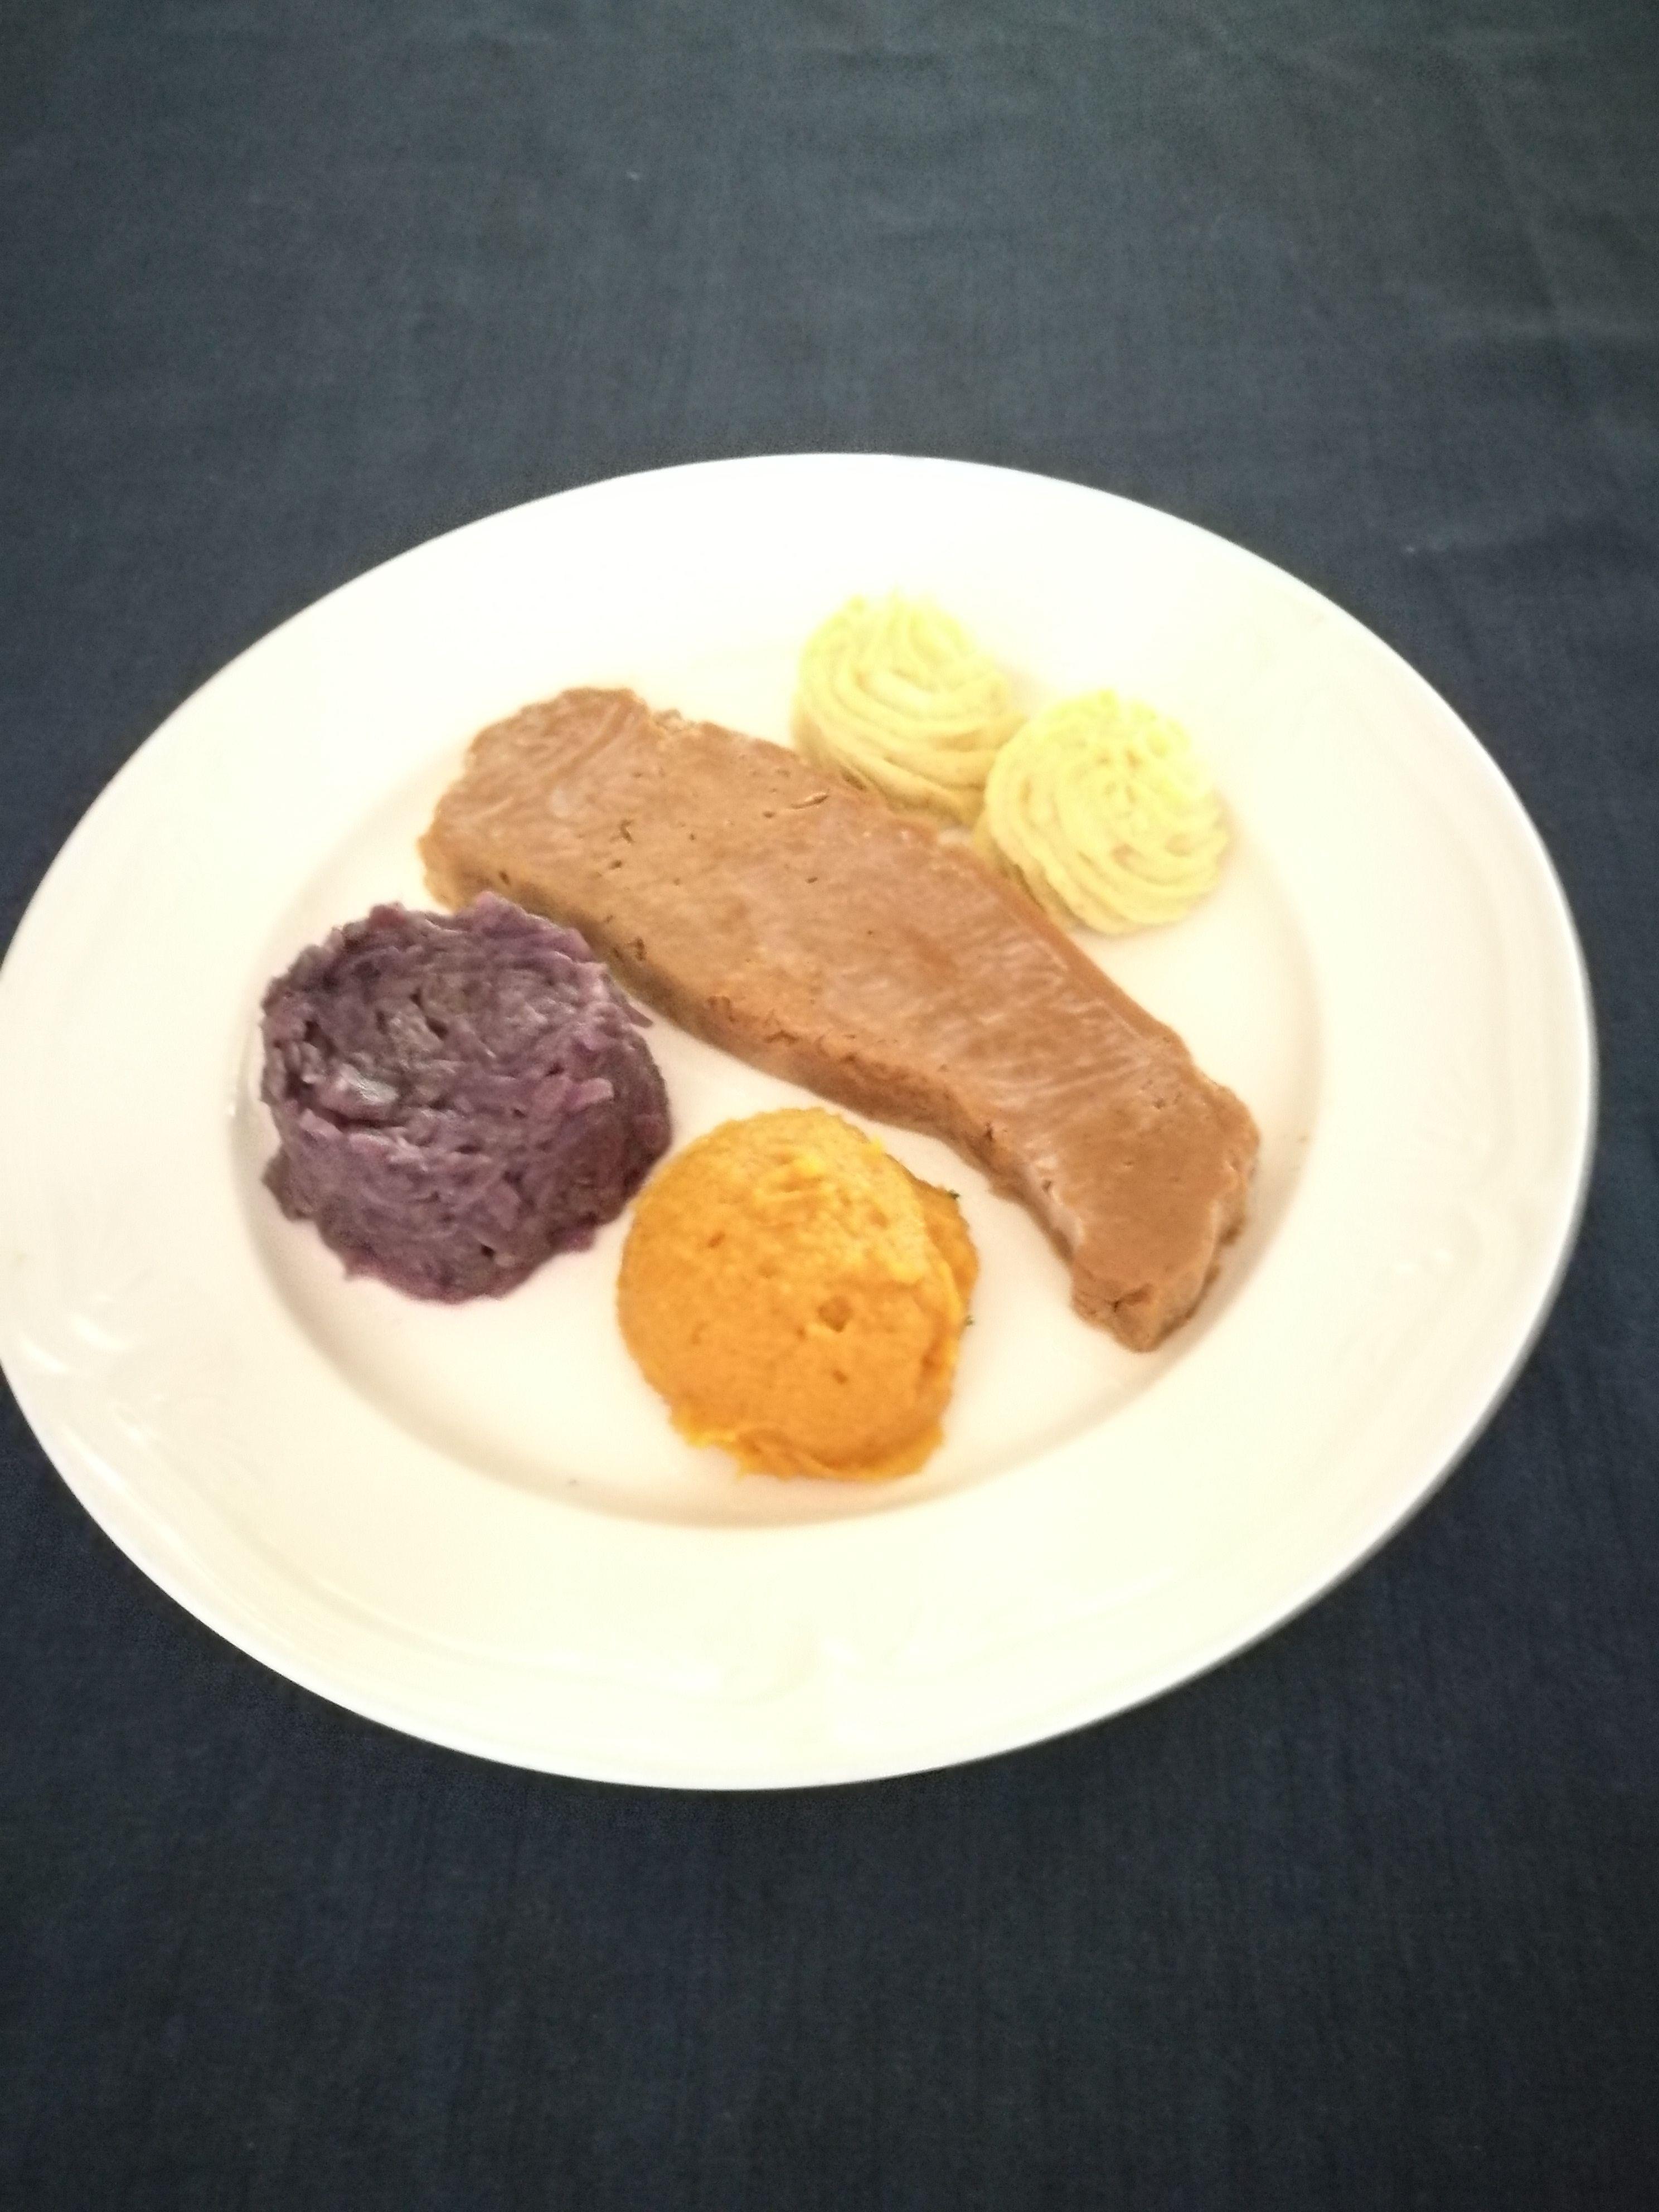 Cuisine Maia pinmaia royal on the pure food co | pinterest | food